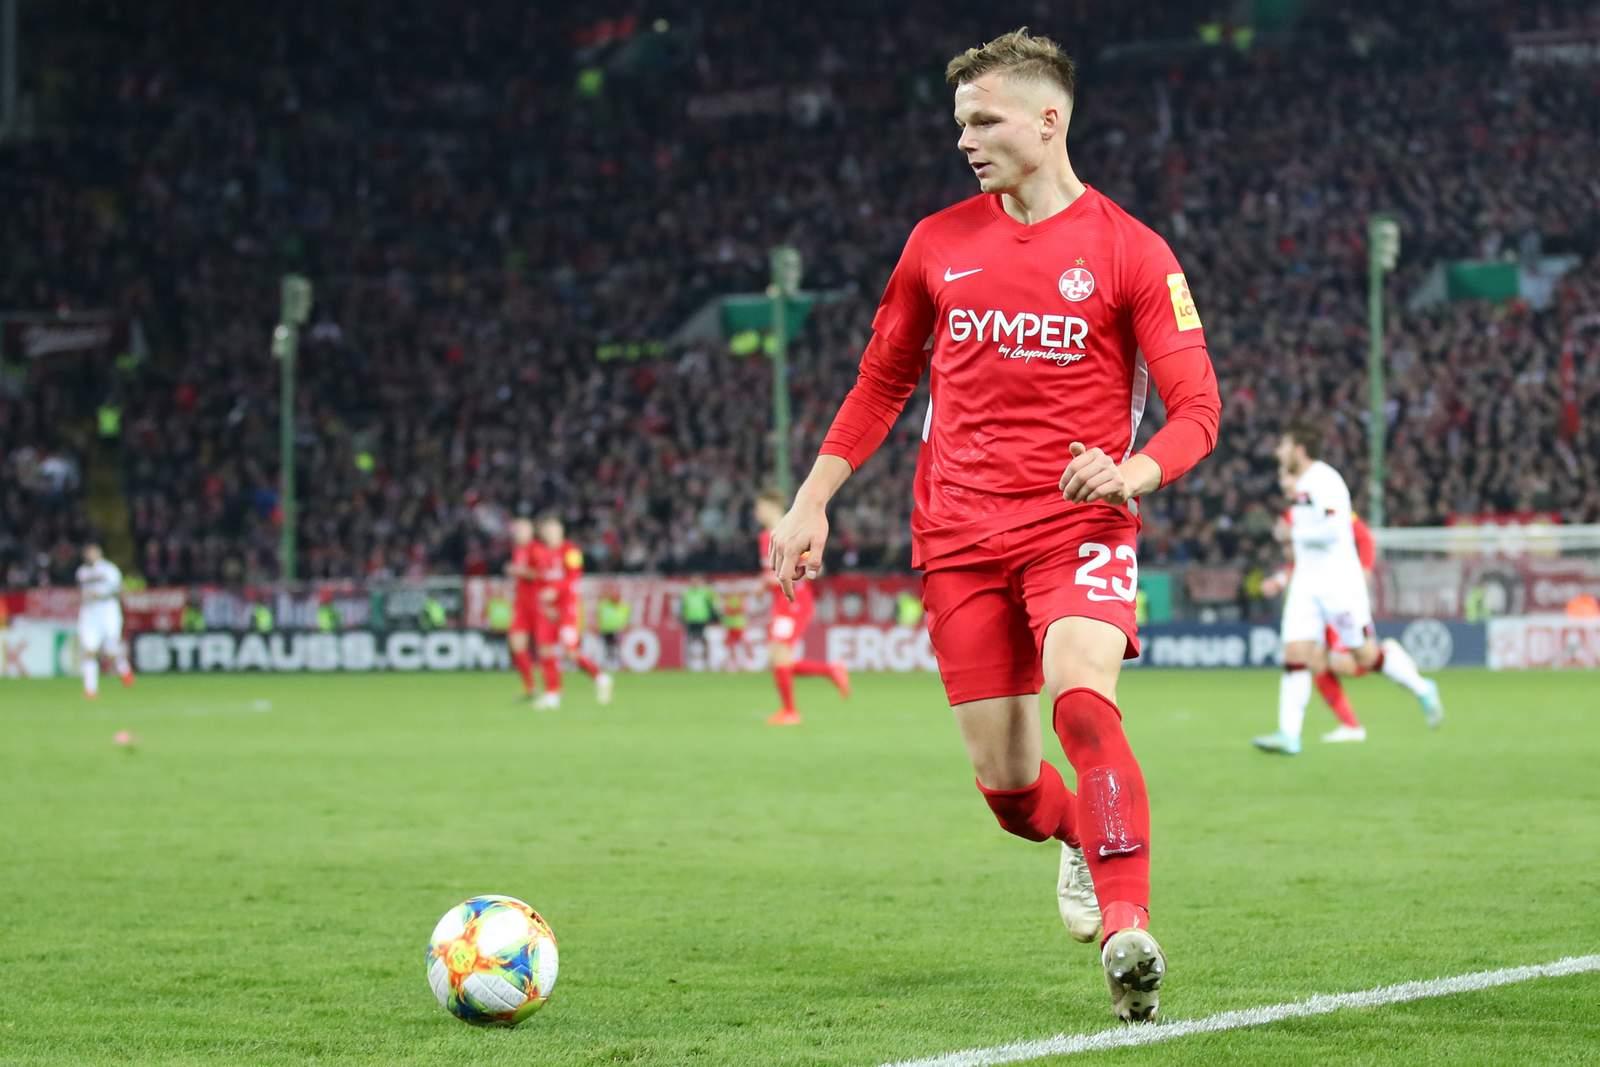 Philipp Hercher im Pokal gegen Nürnberg.